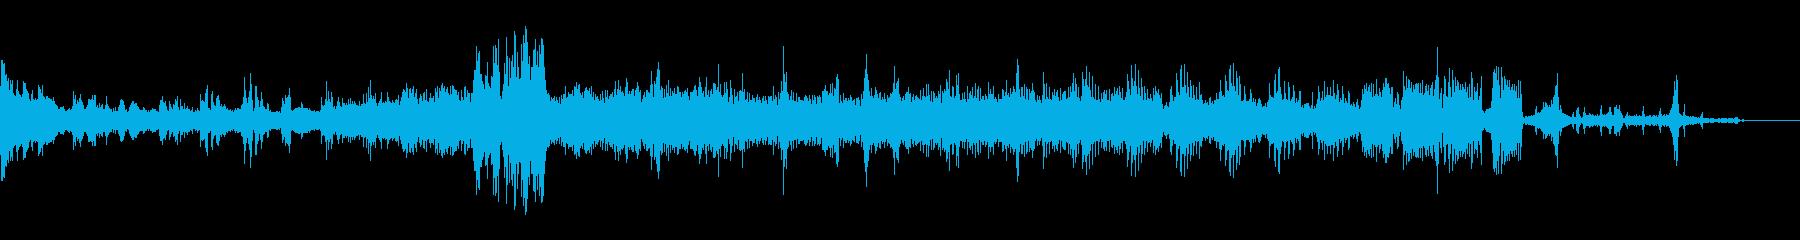 Space Fx:ドロイドの機能不全の再生済みの波形